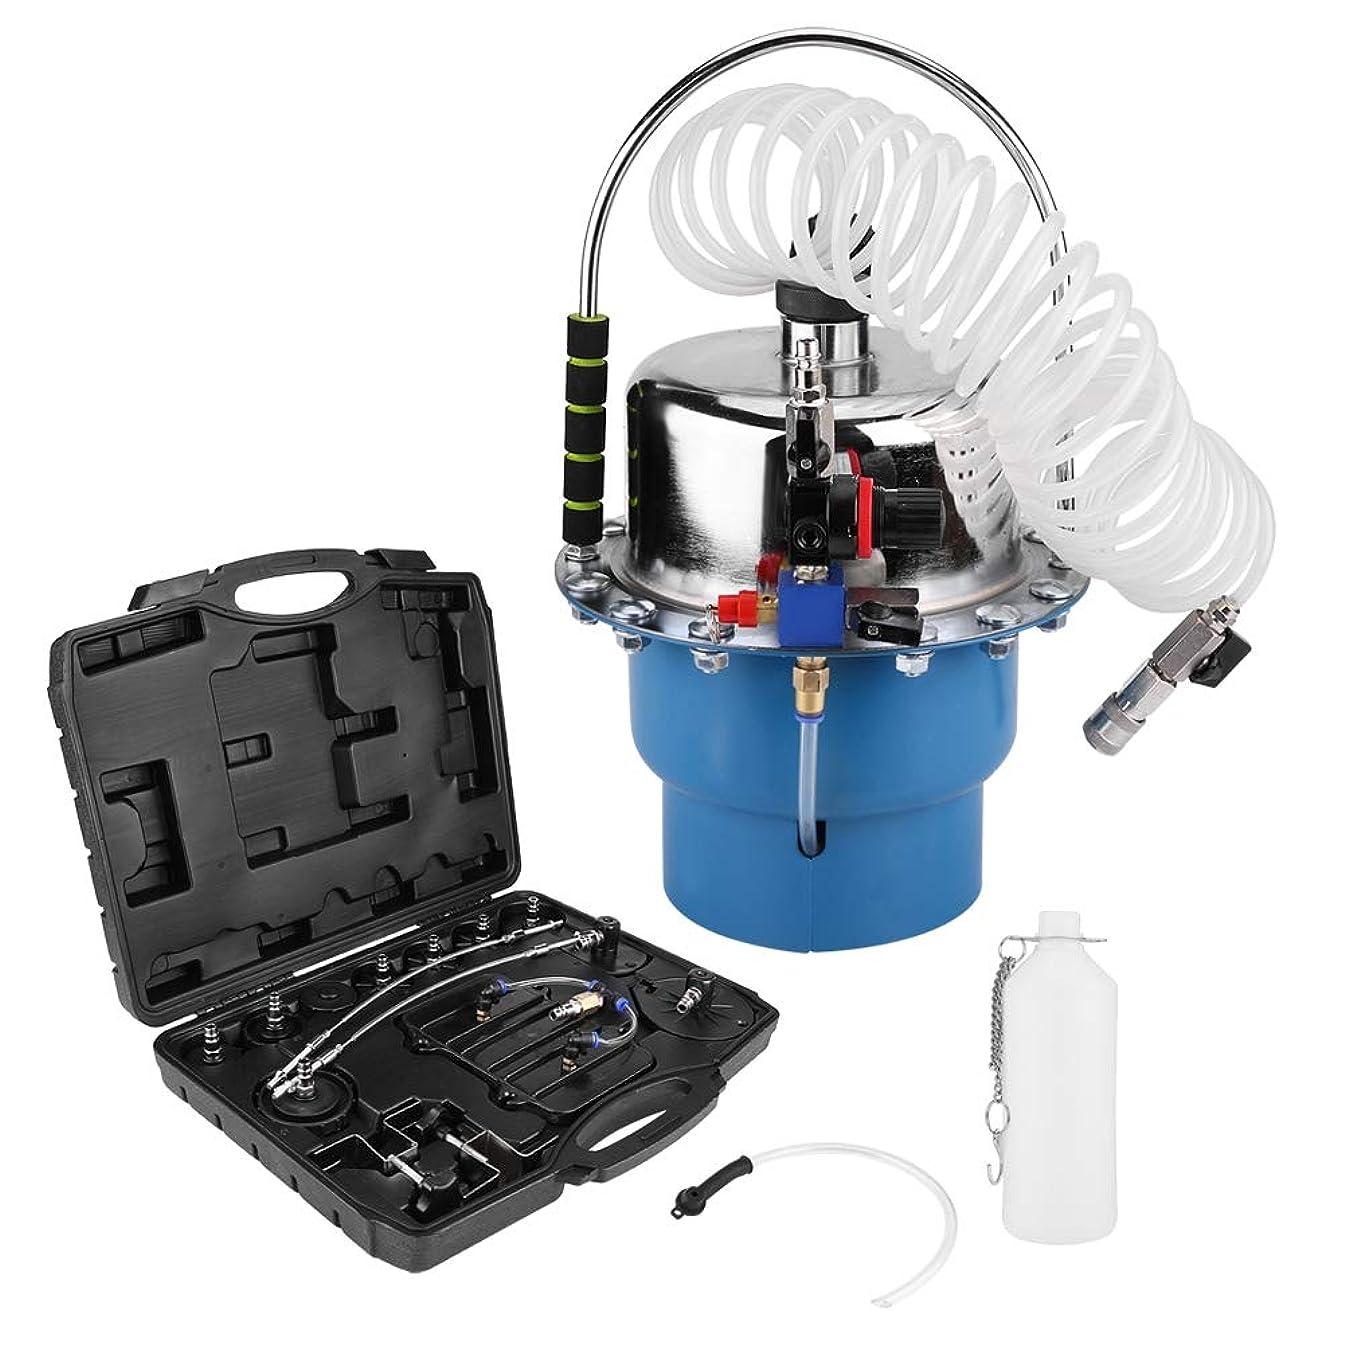 Professional Power Brake Bleeder Kit, Air Pressure Pneumatic Brake Bleeding Tool and Clutch Bleeder Valve System Set